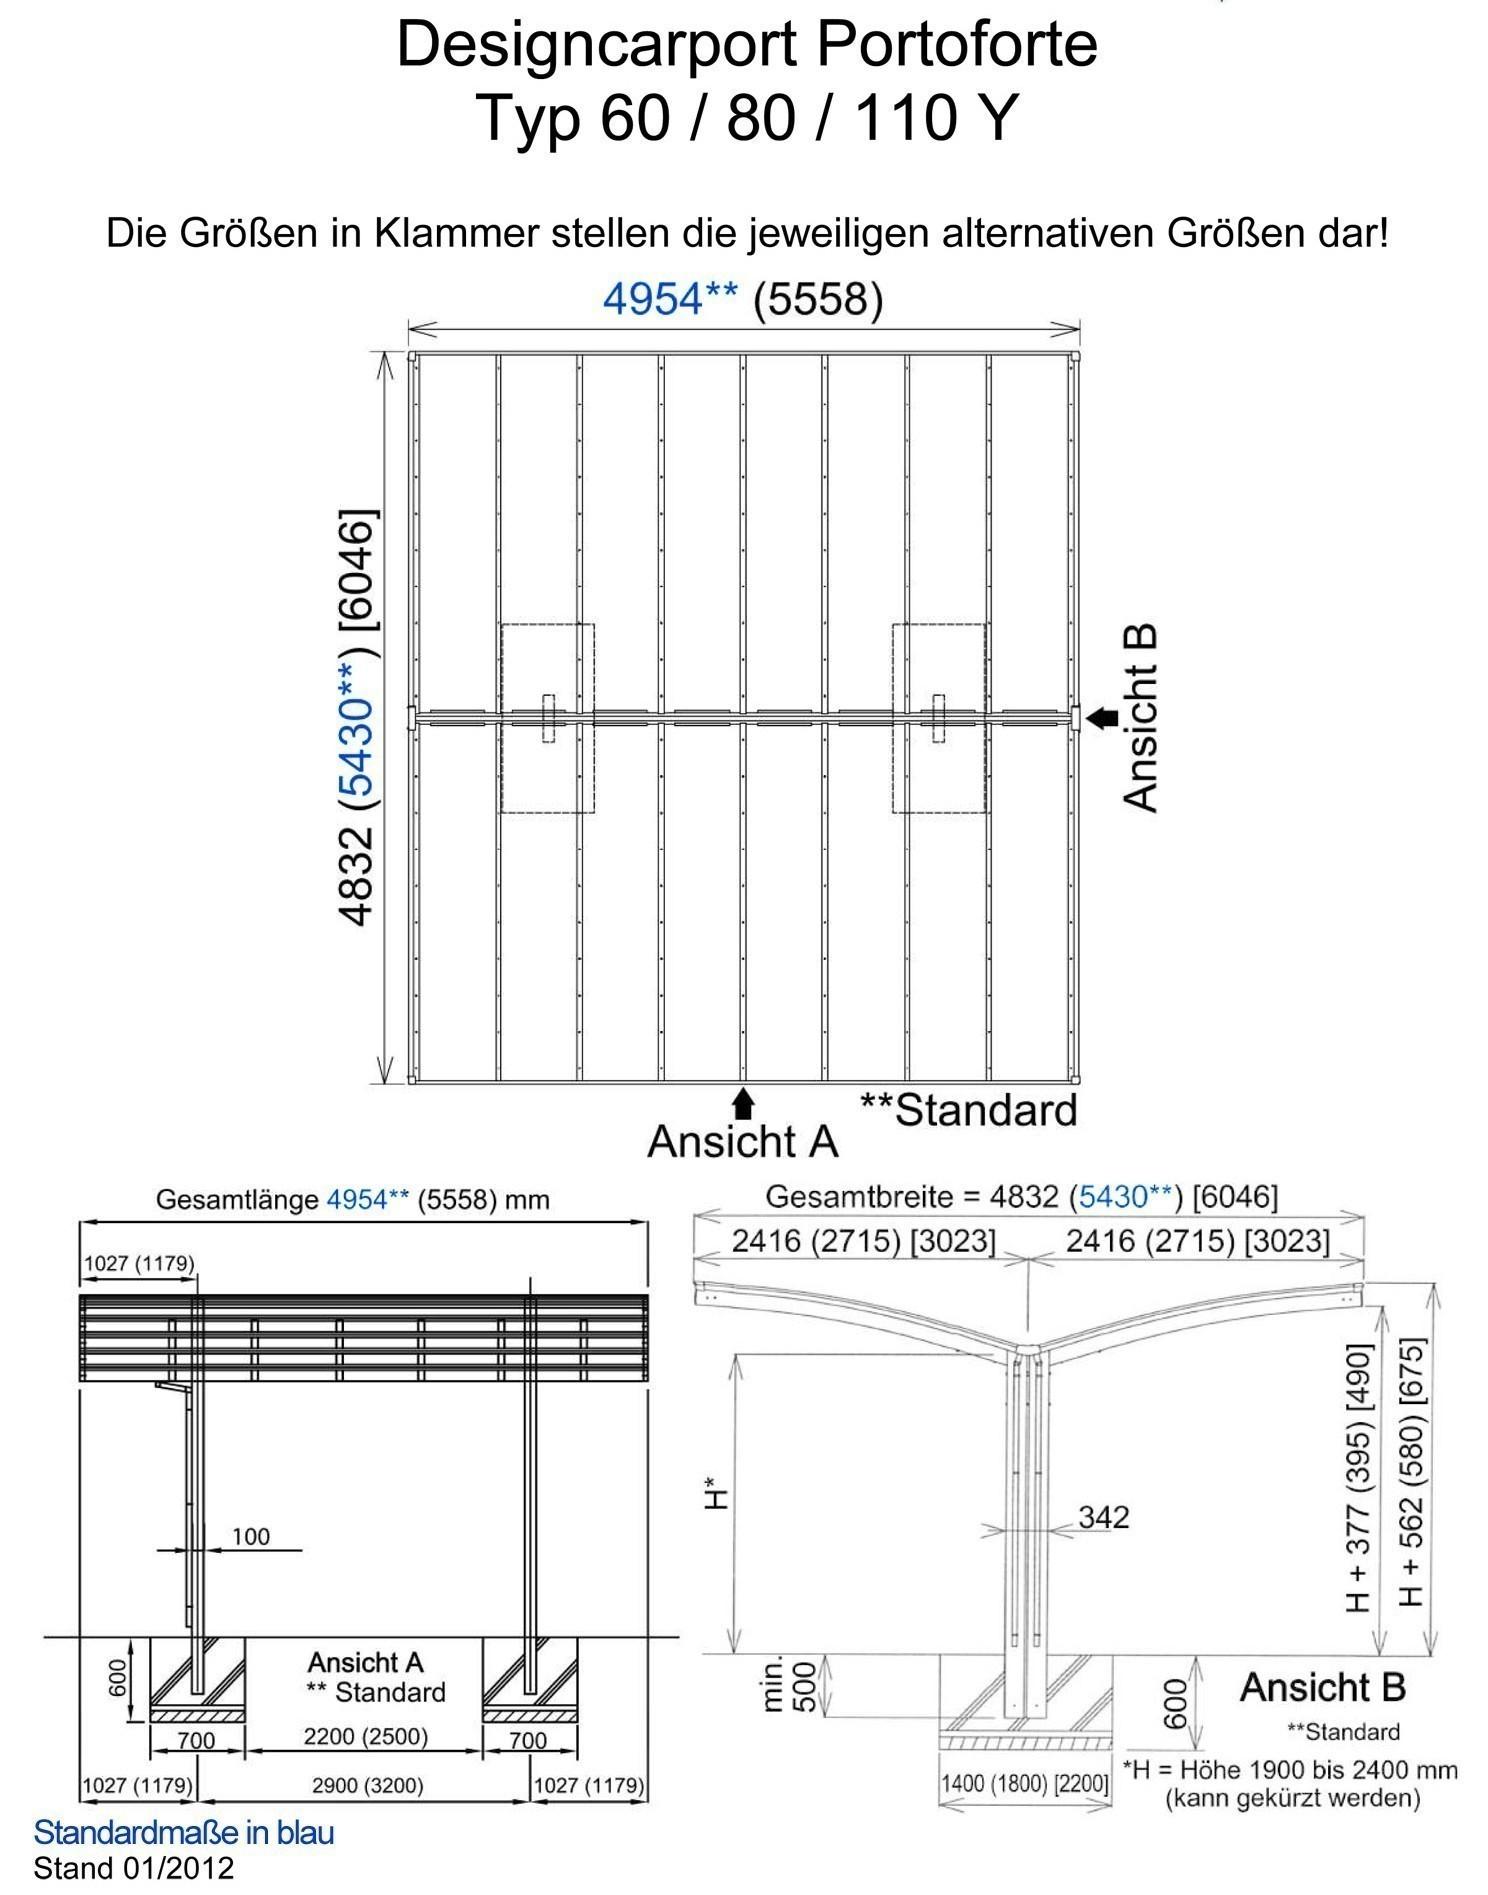 Carport XIMAX Portoforte Alu Typ 80 Y ES 495x543x248cm Bild 2